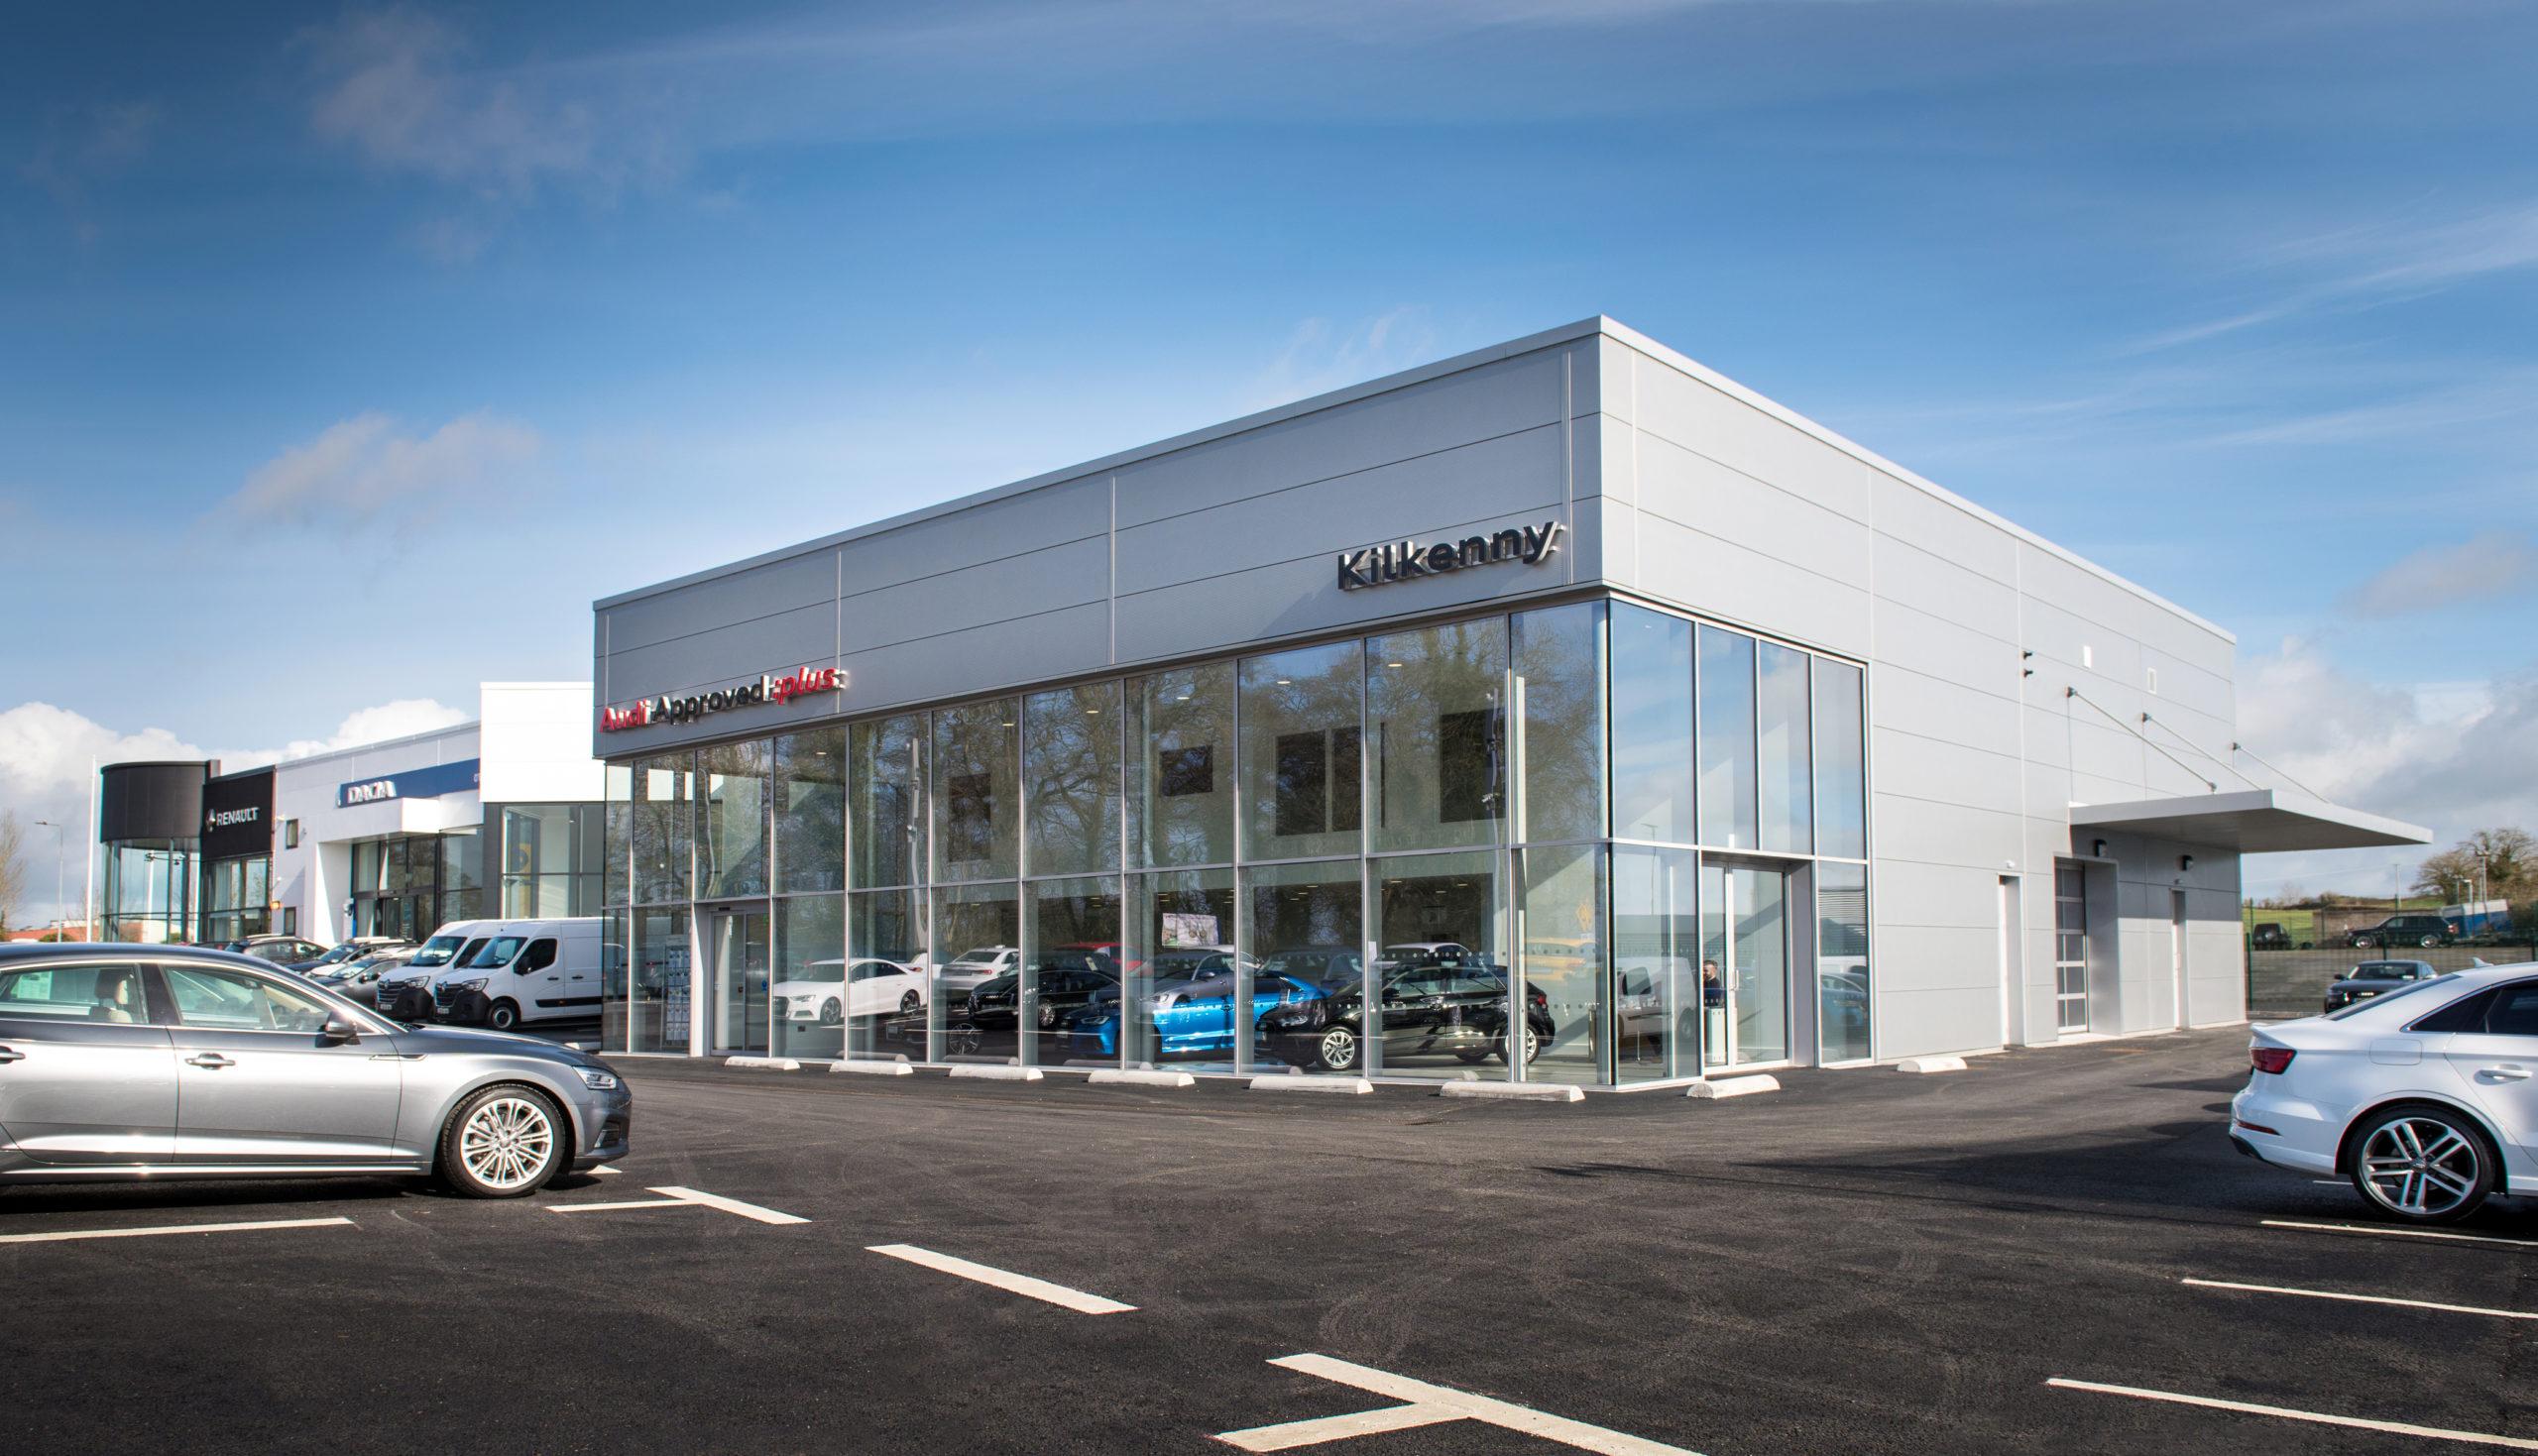 Audi Approved Plus Kilkenny